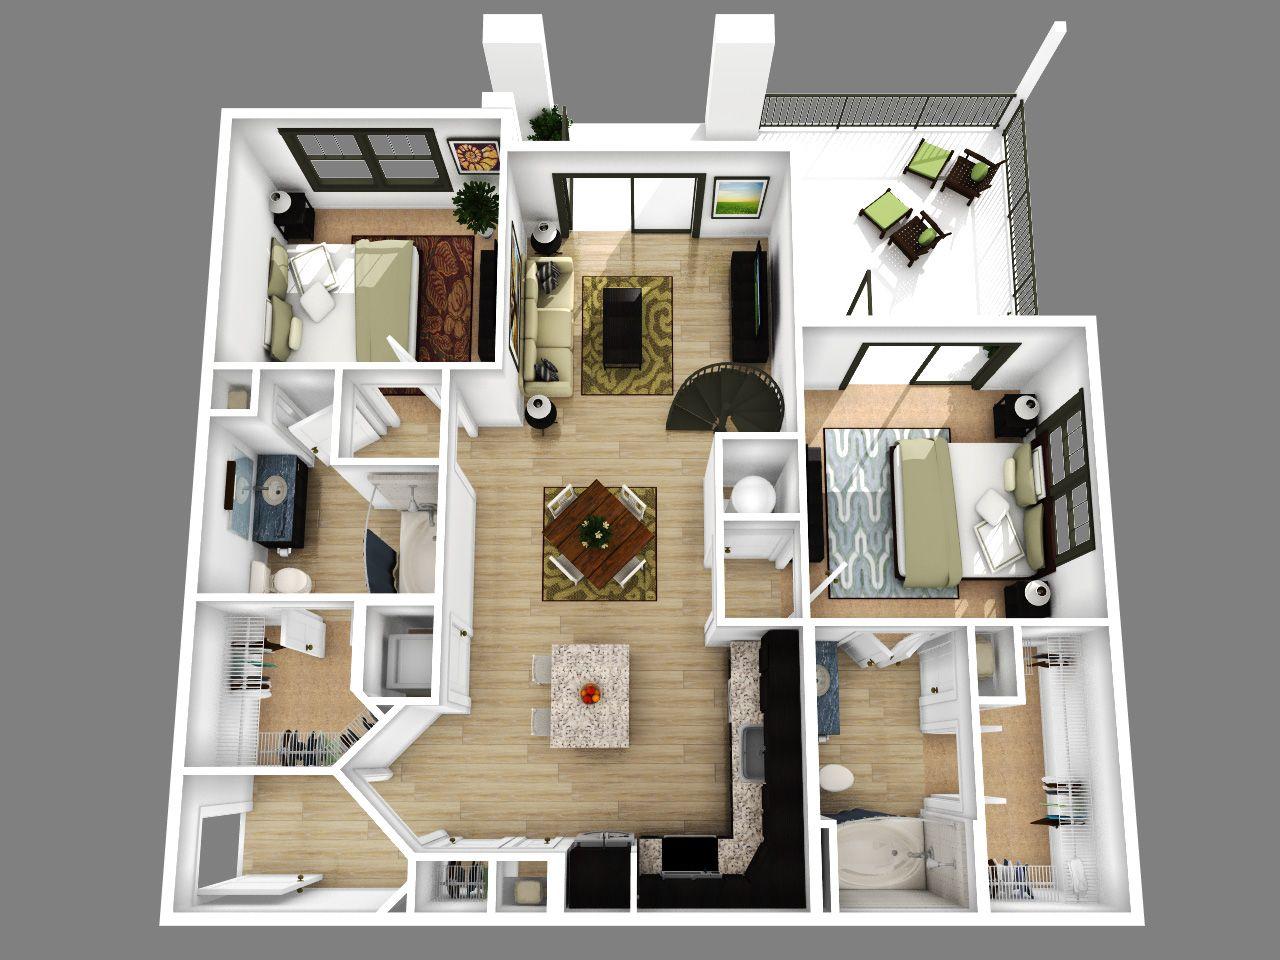 50 Two 2 Bedroom Apartment House Plans Architecture Design Apartment Floor Plans Three Bedroom House Plan 3d House Plans